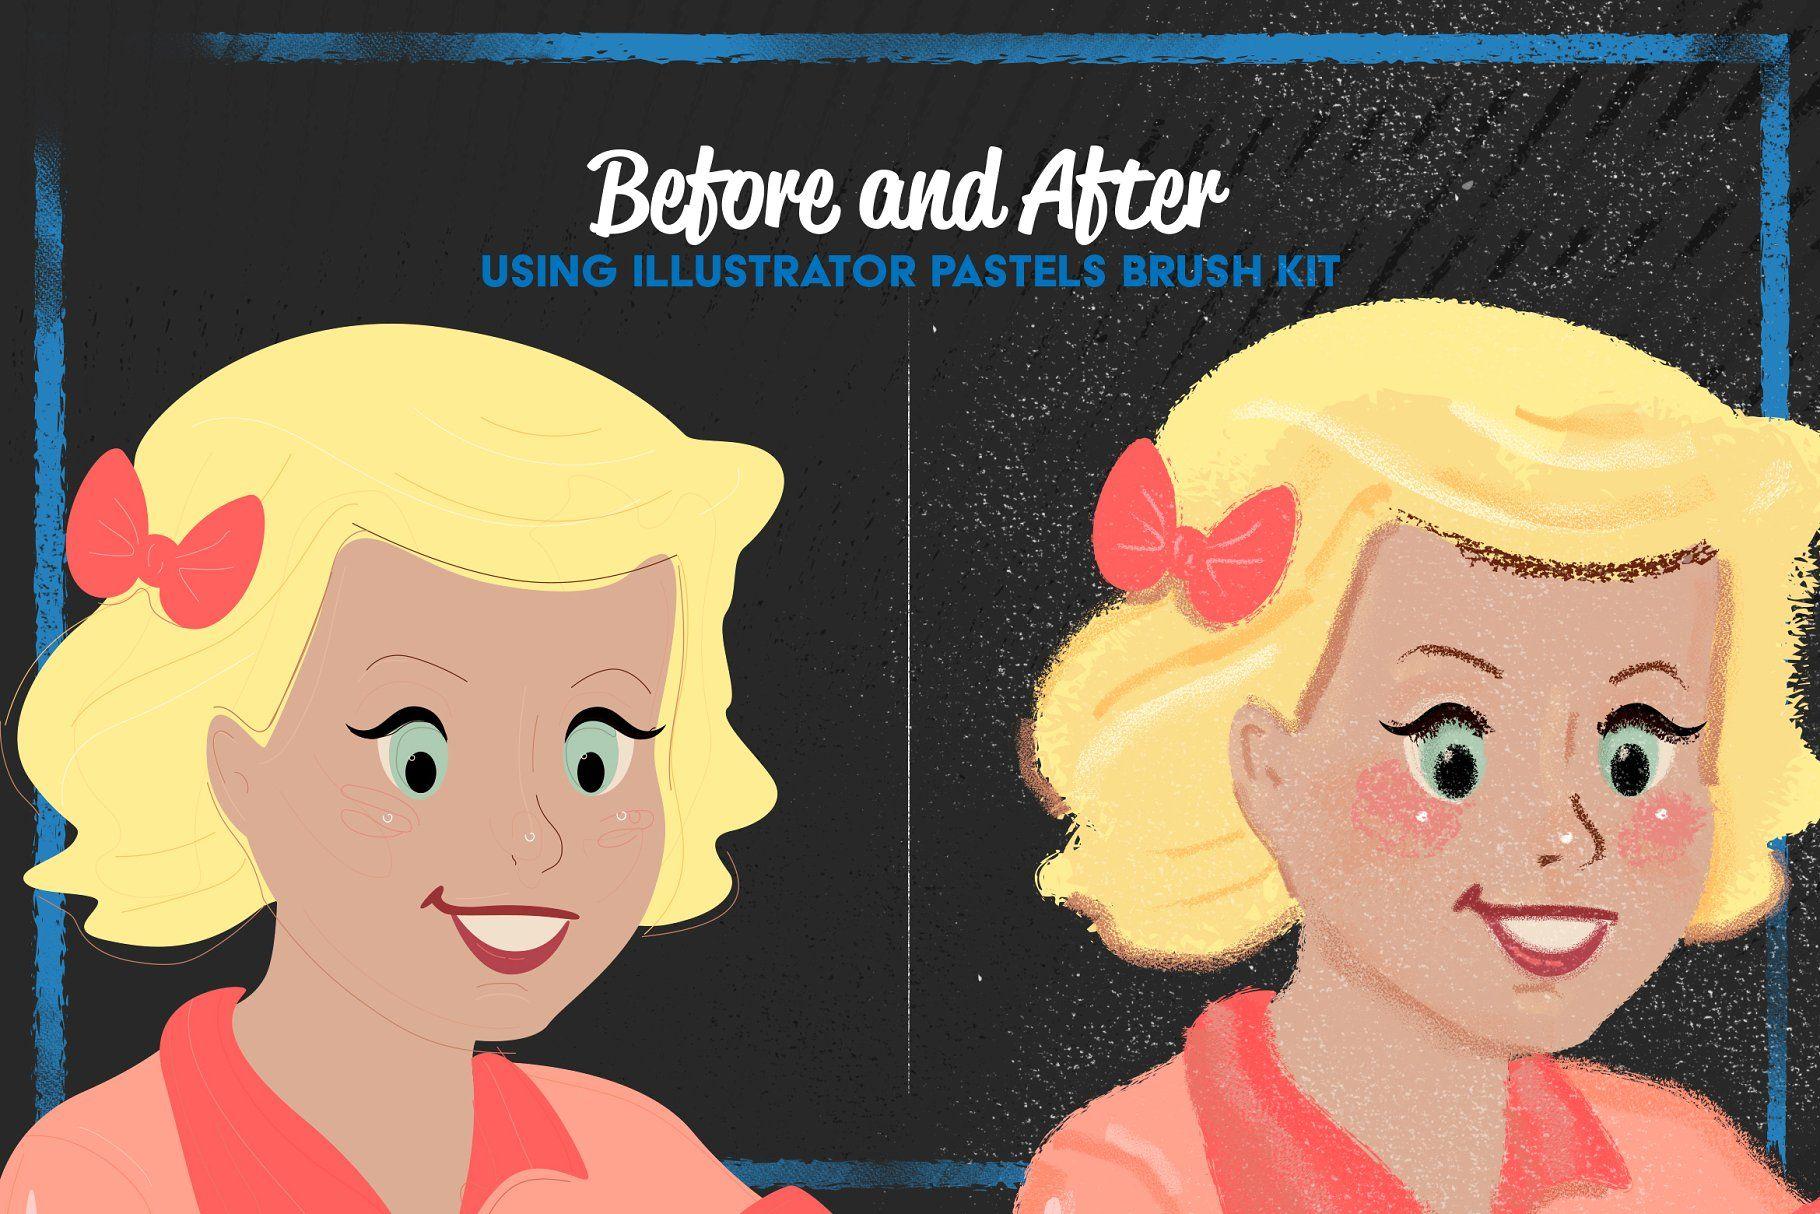 Pastels Illustrator Brush Kit Illustratorpastelsbrushbrushes